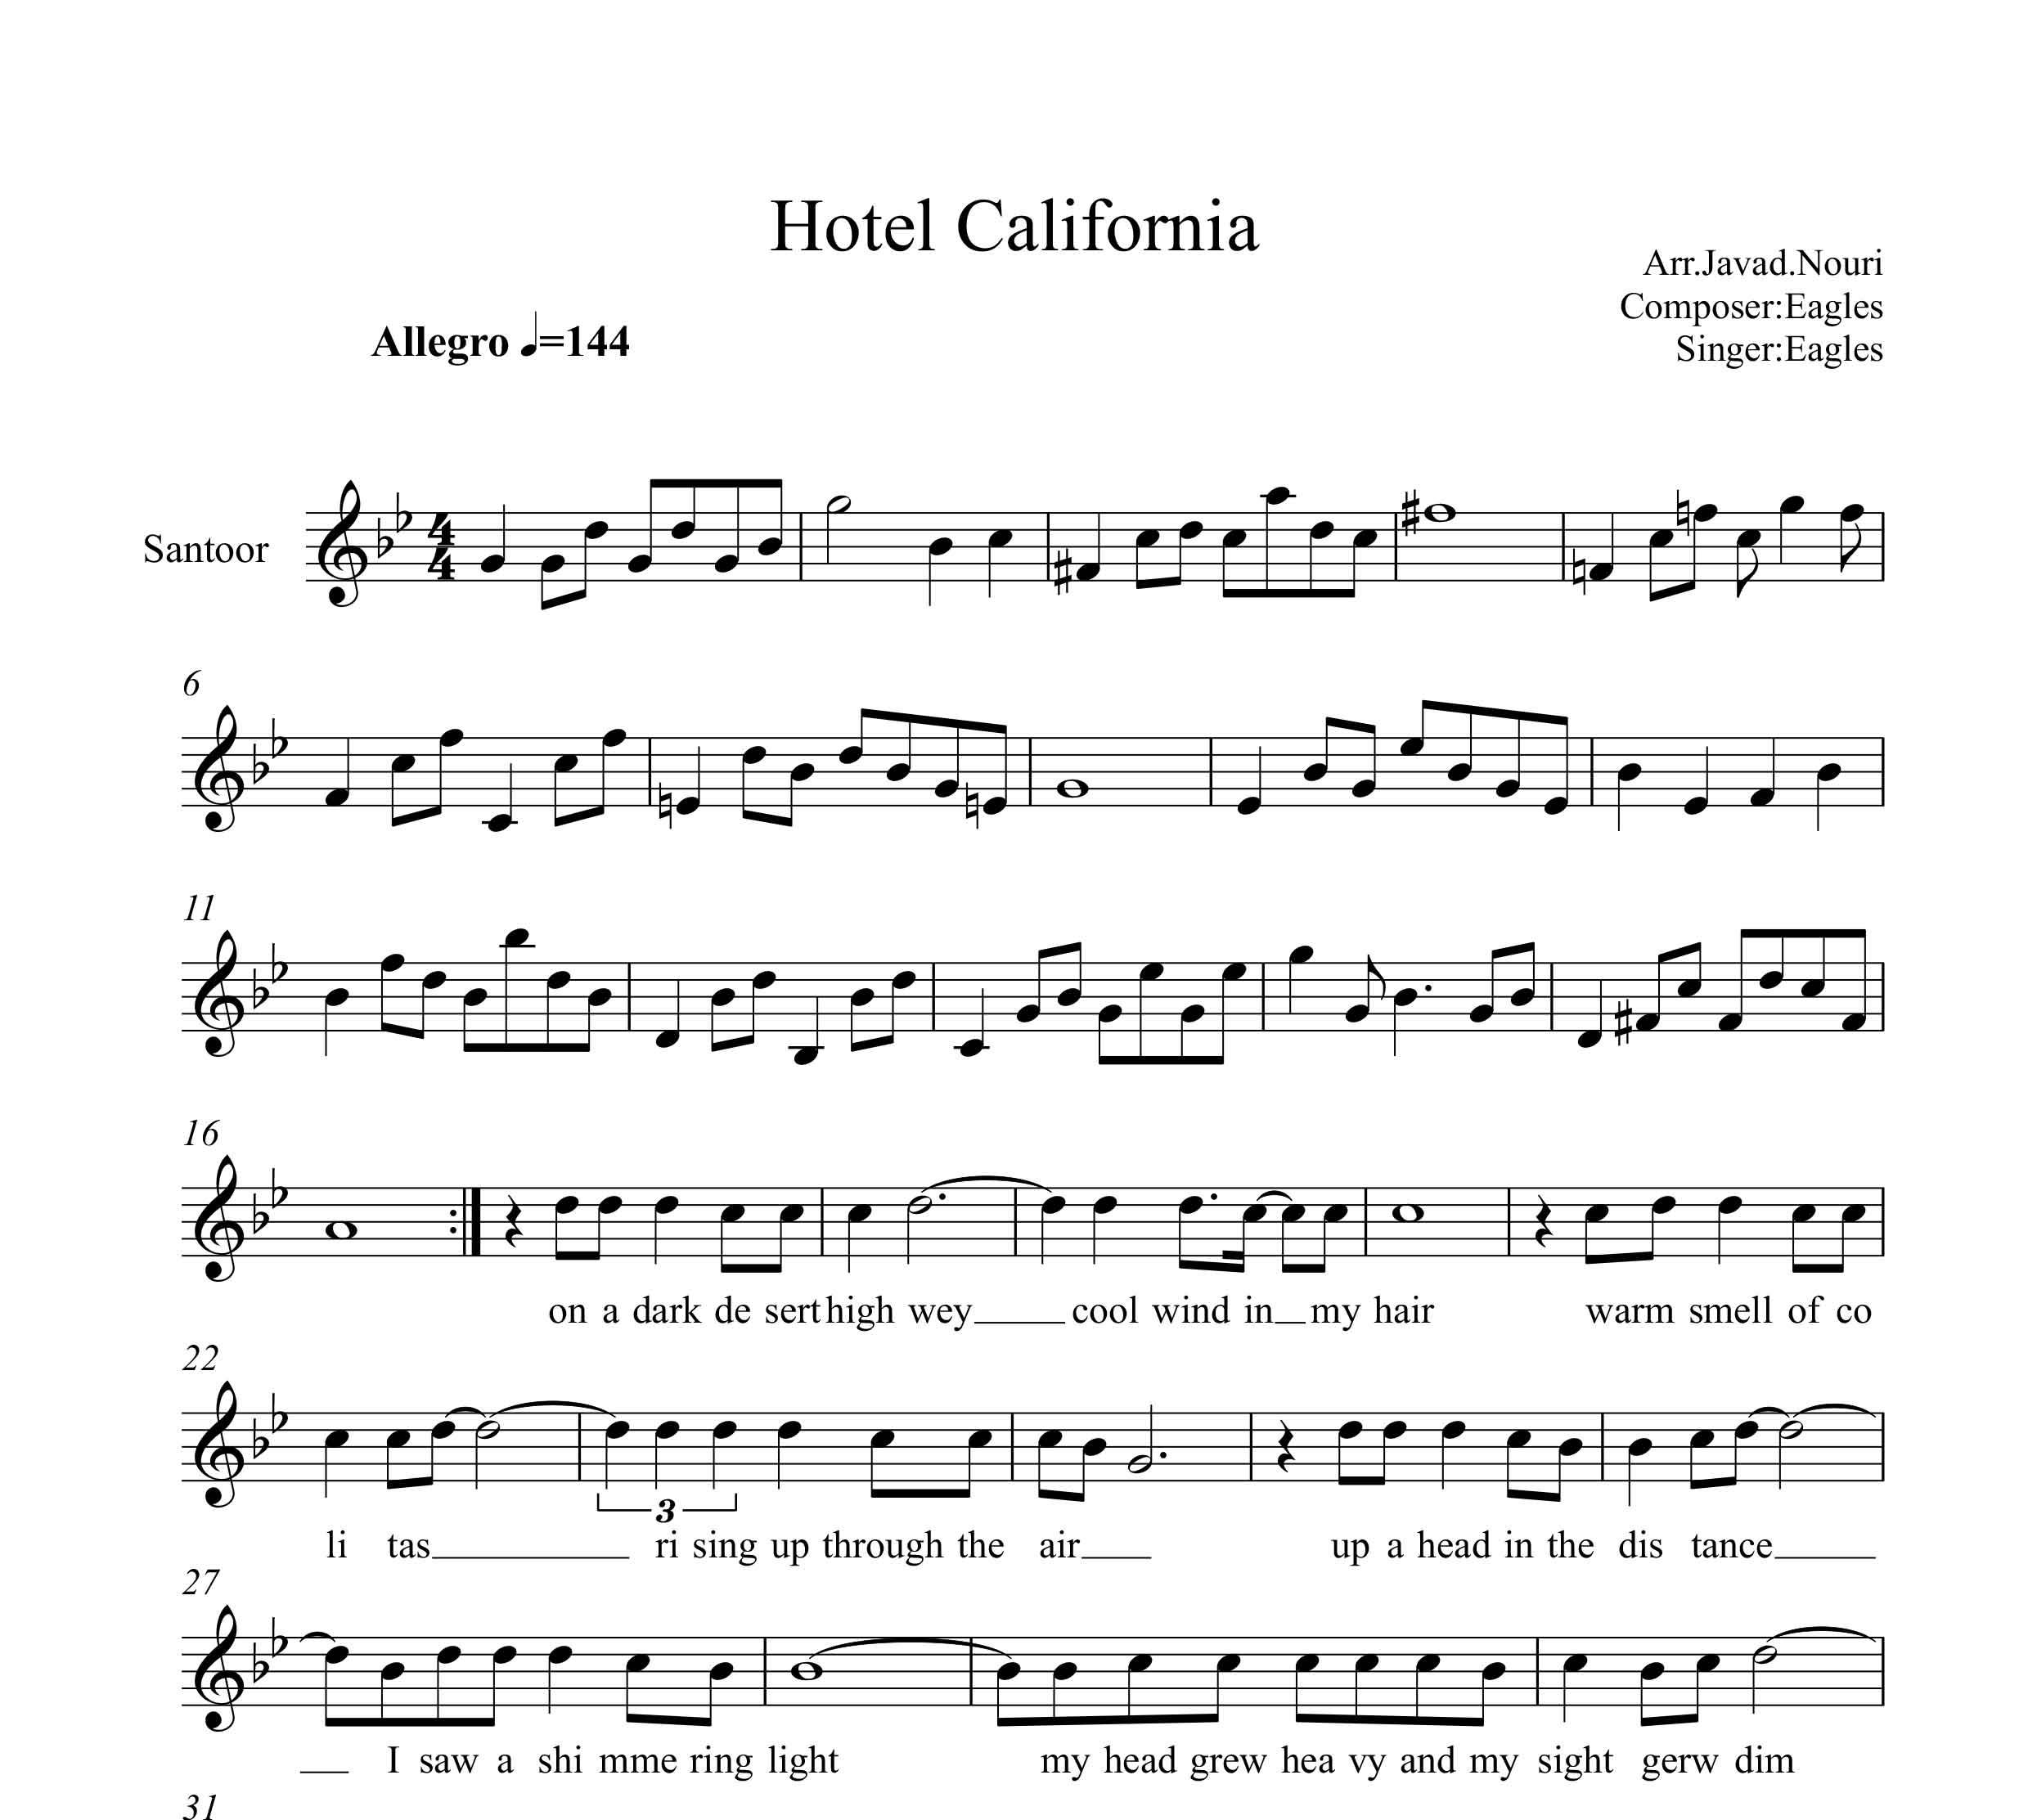 نت سنتور هتل کالیفرنیا با تنظیم جواد نوری